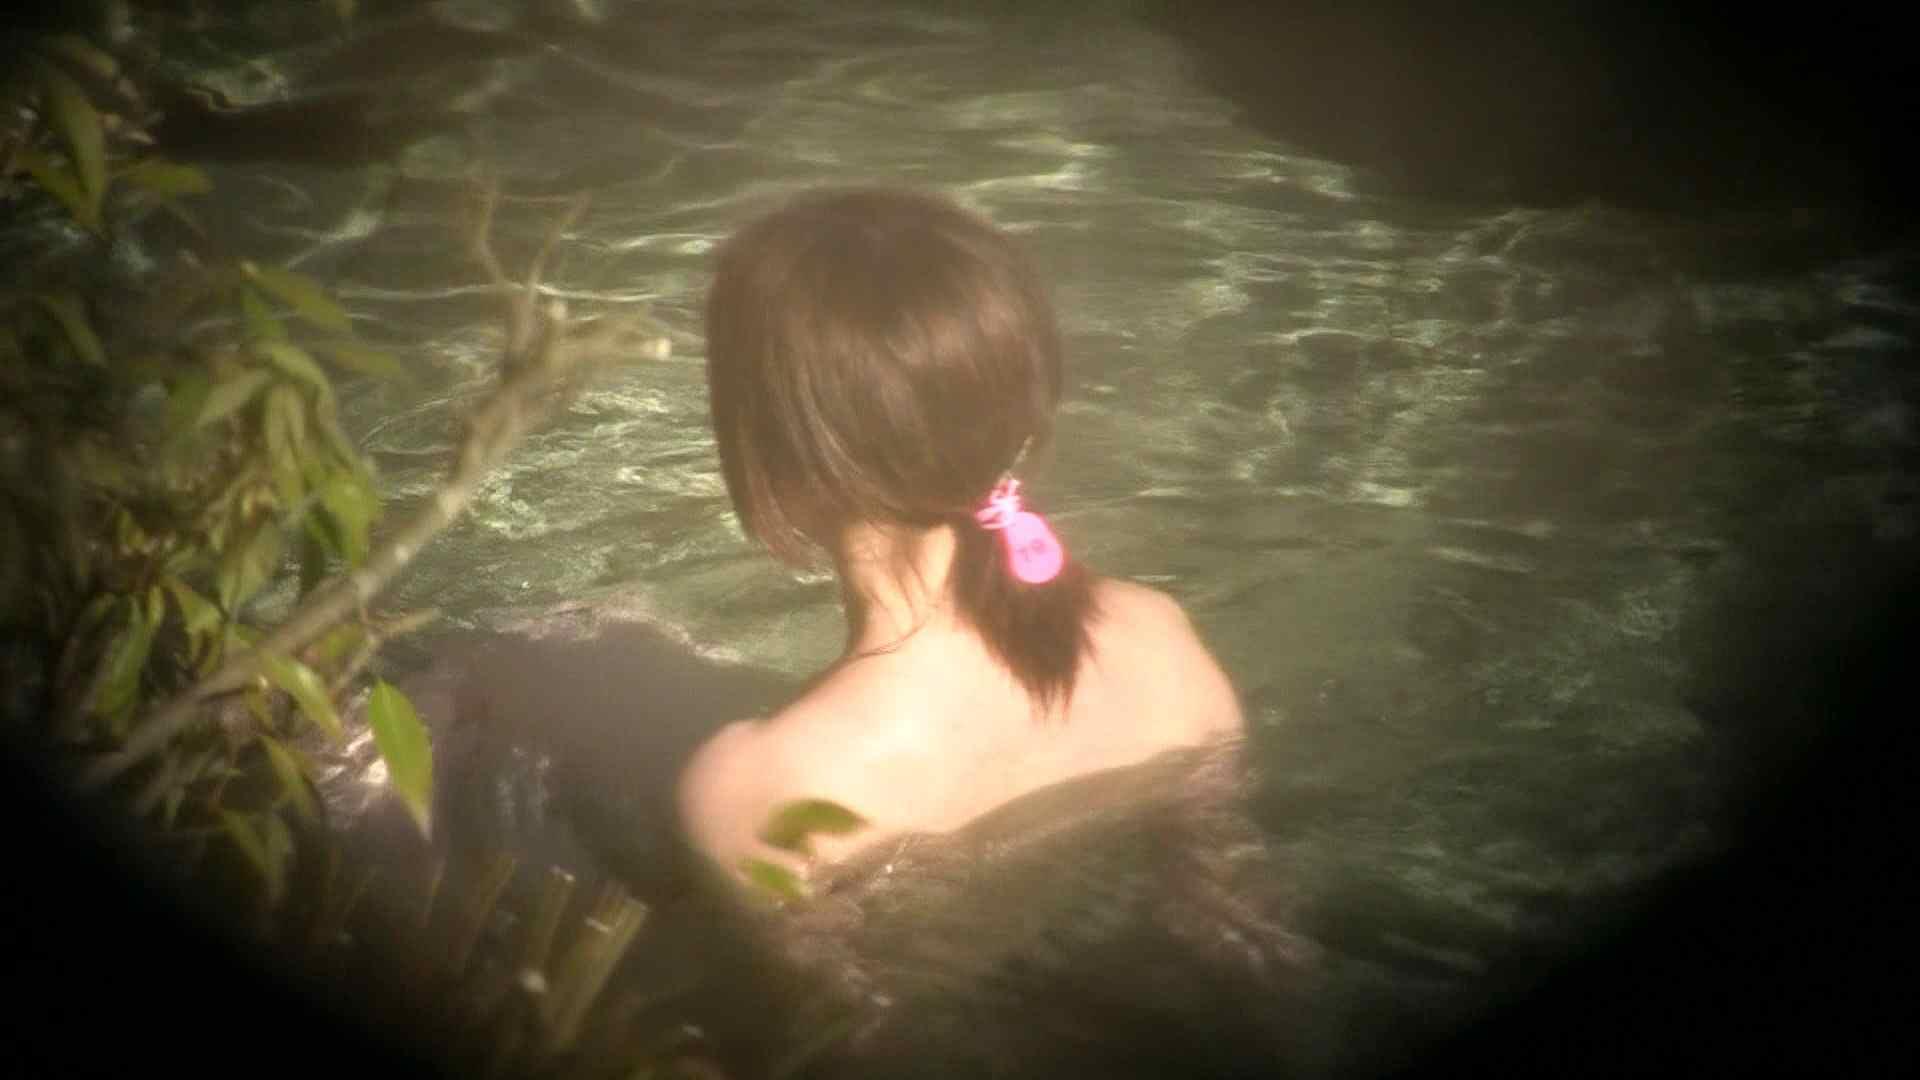 Aquaな露天風呂Vol.698 盗撮 | HなOL  86pic 49